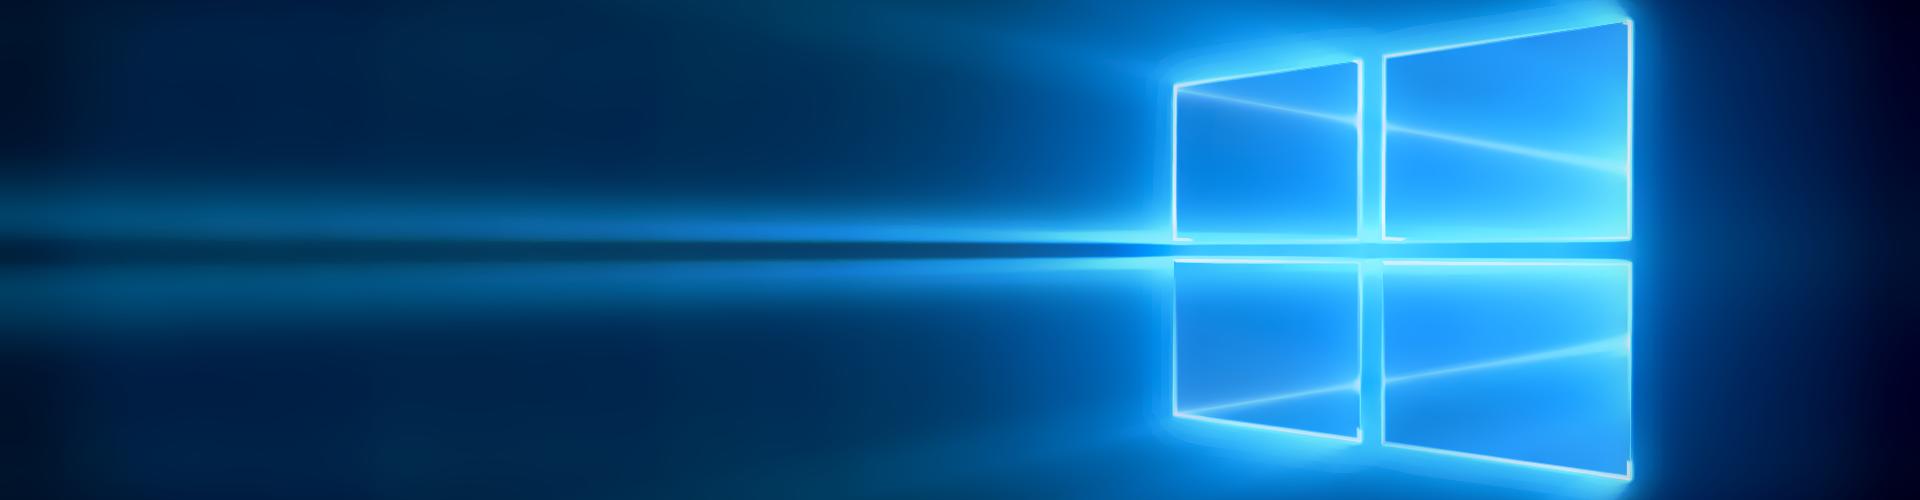 Windows_10-slide